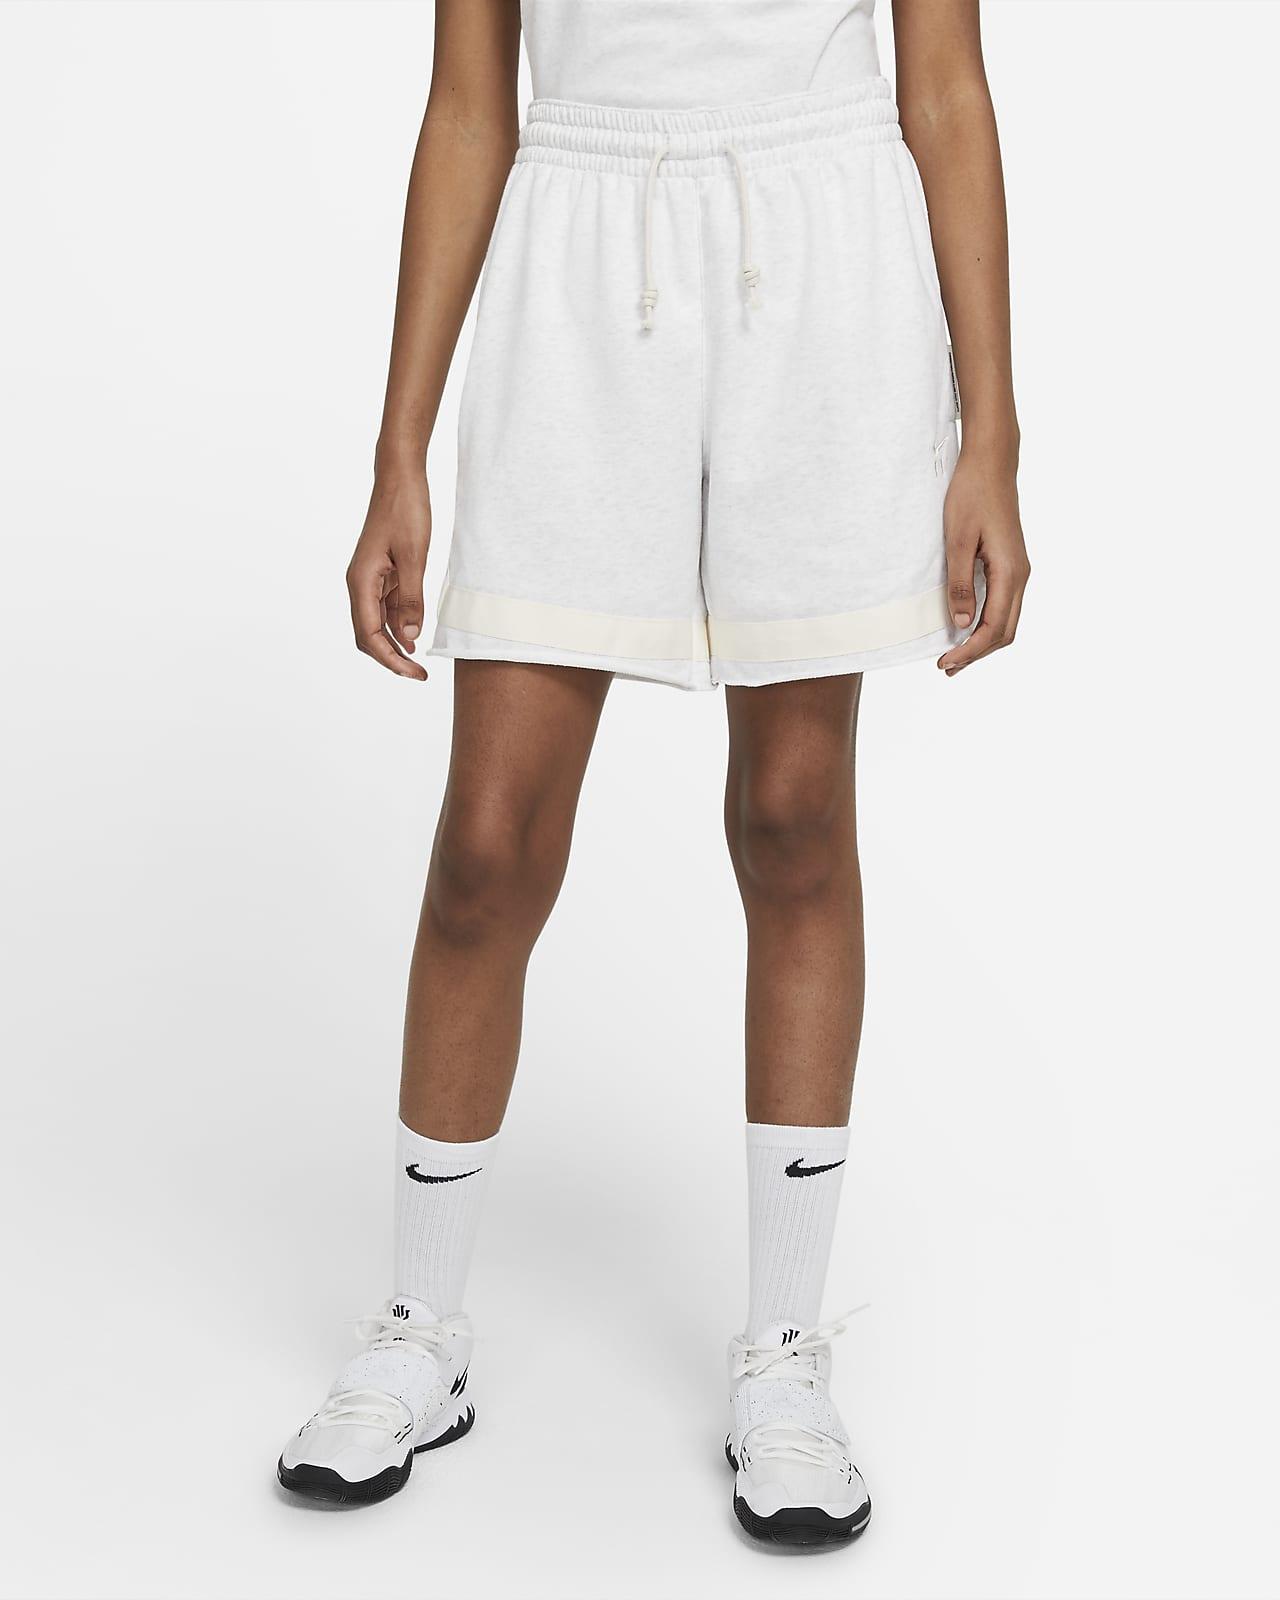 Nike Standard Issue Swoosh Fly Women's Basketball Shorts